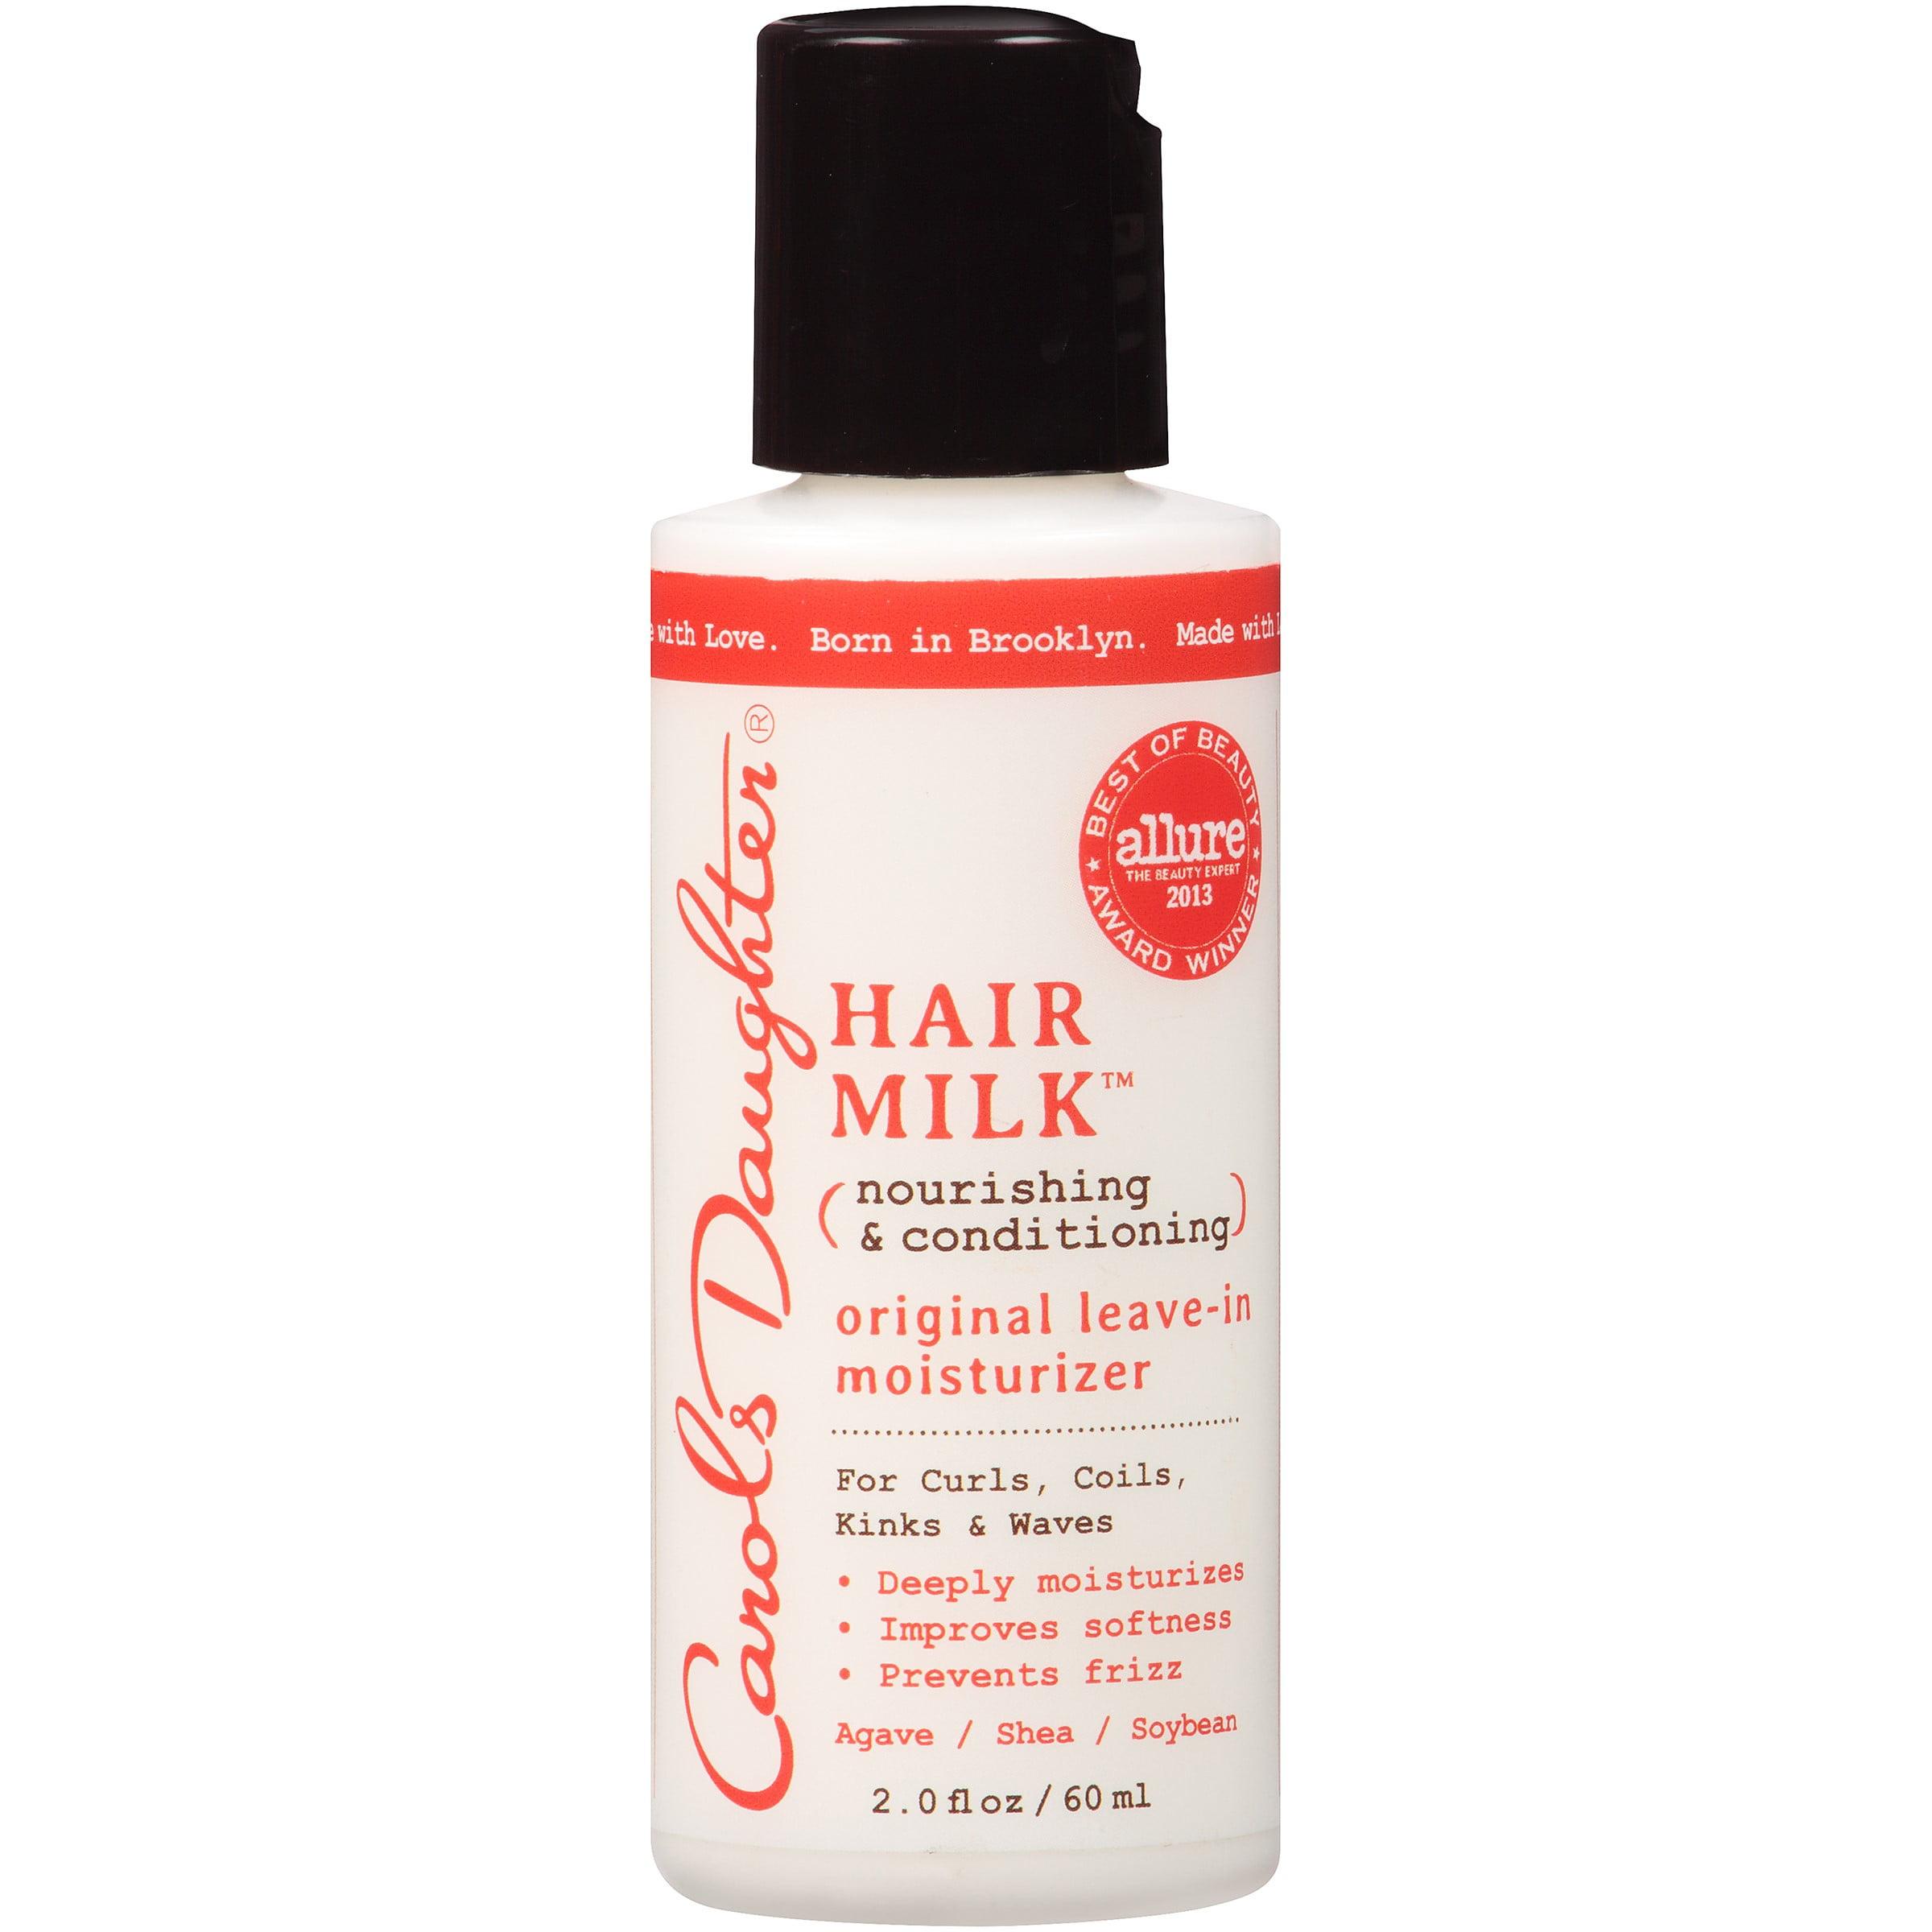 Carol's Daughter Hair Milk Original Leave In Moisturizer, 2 Oz